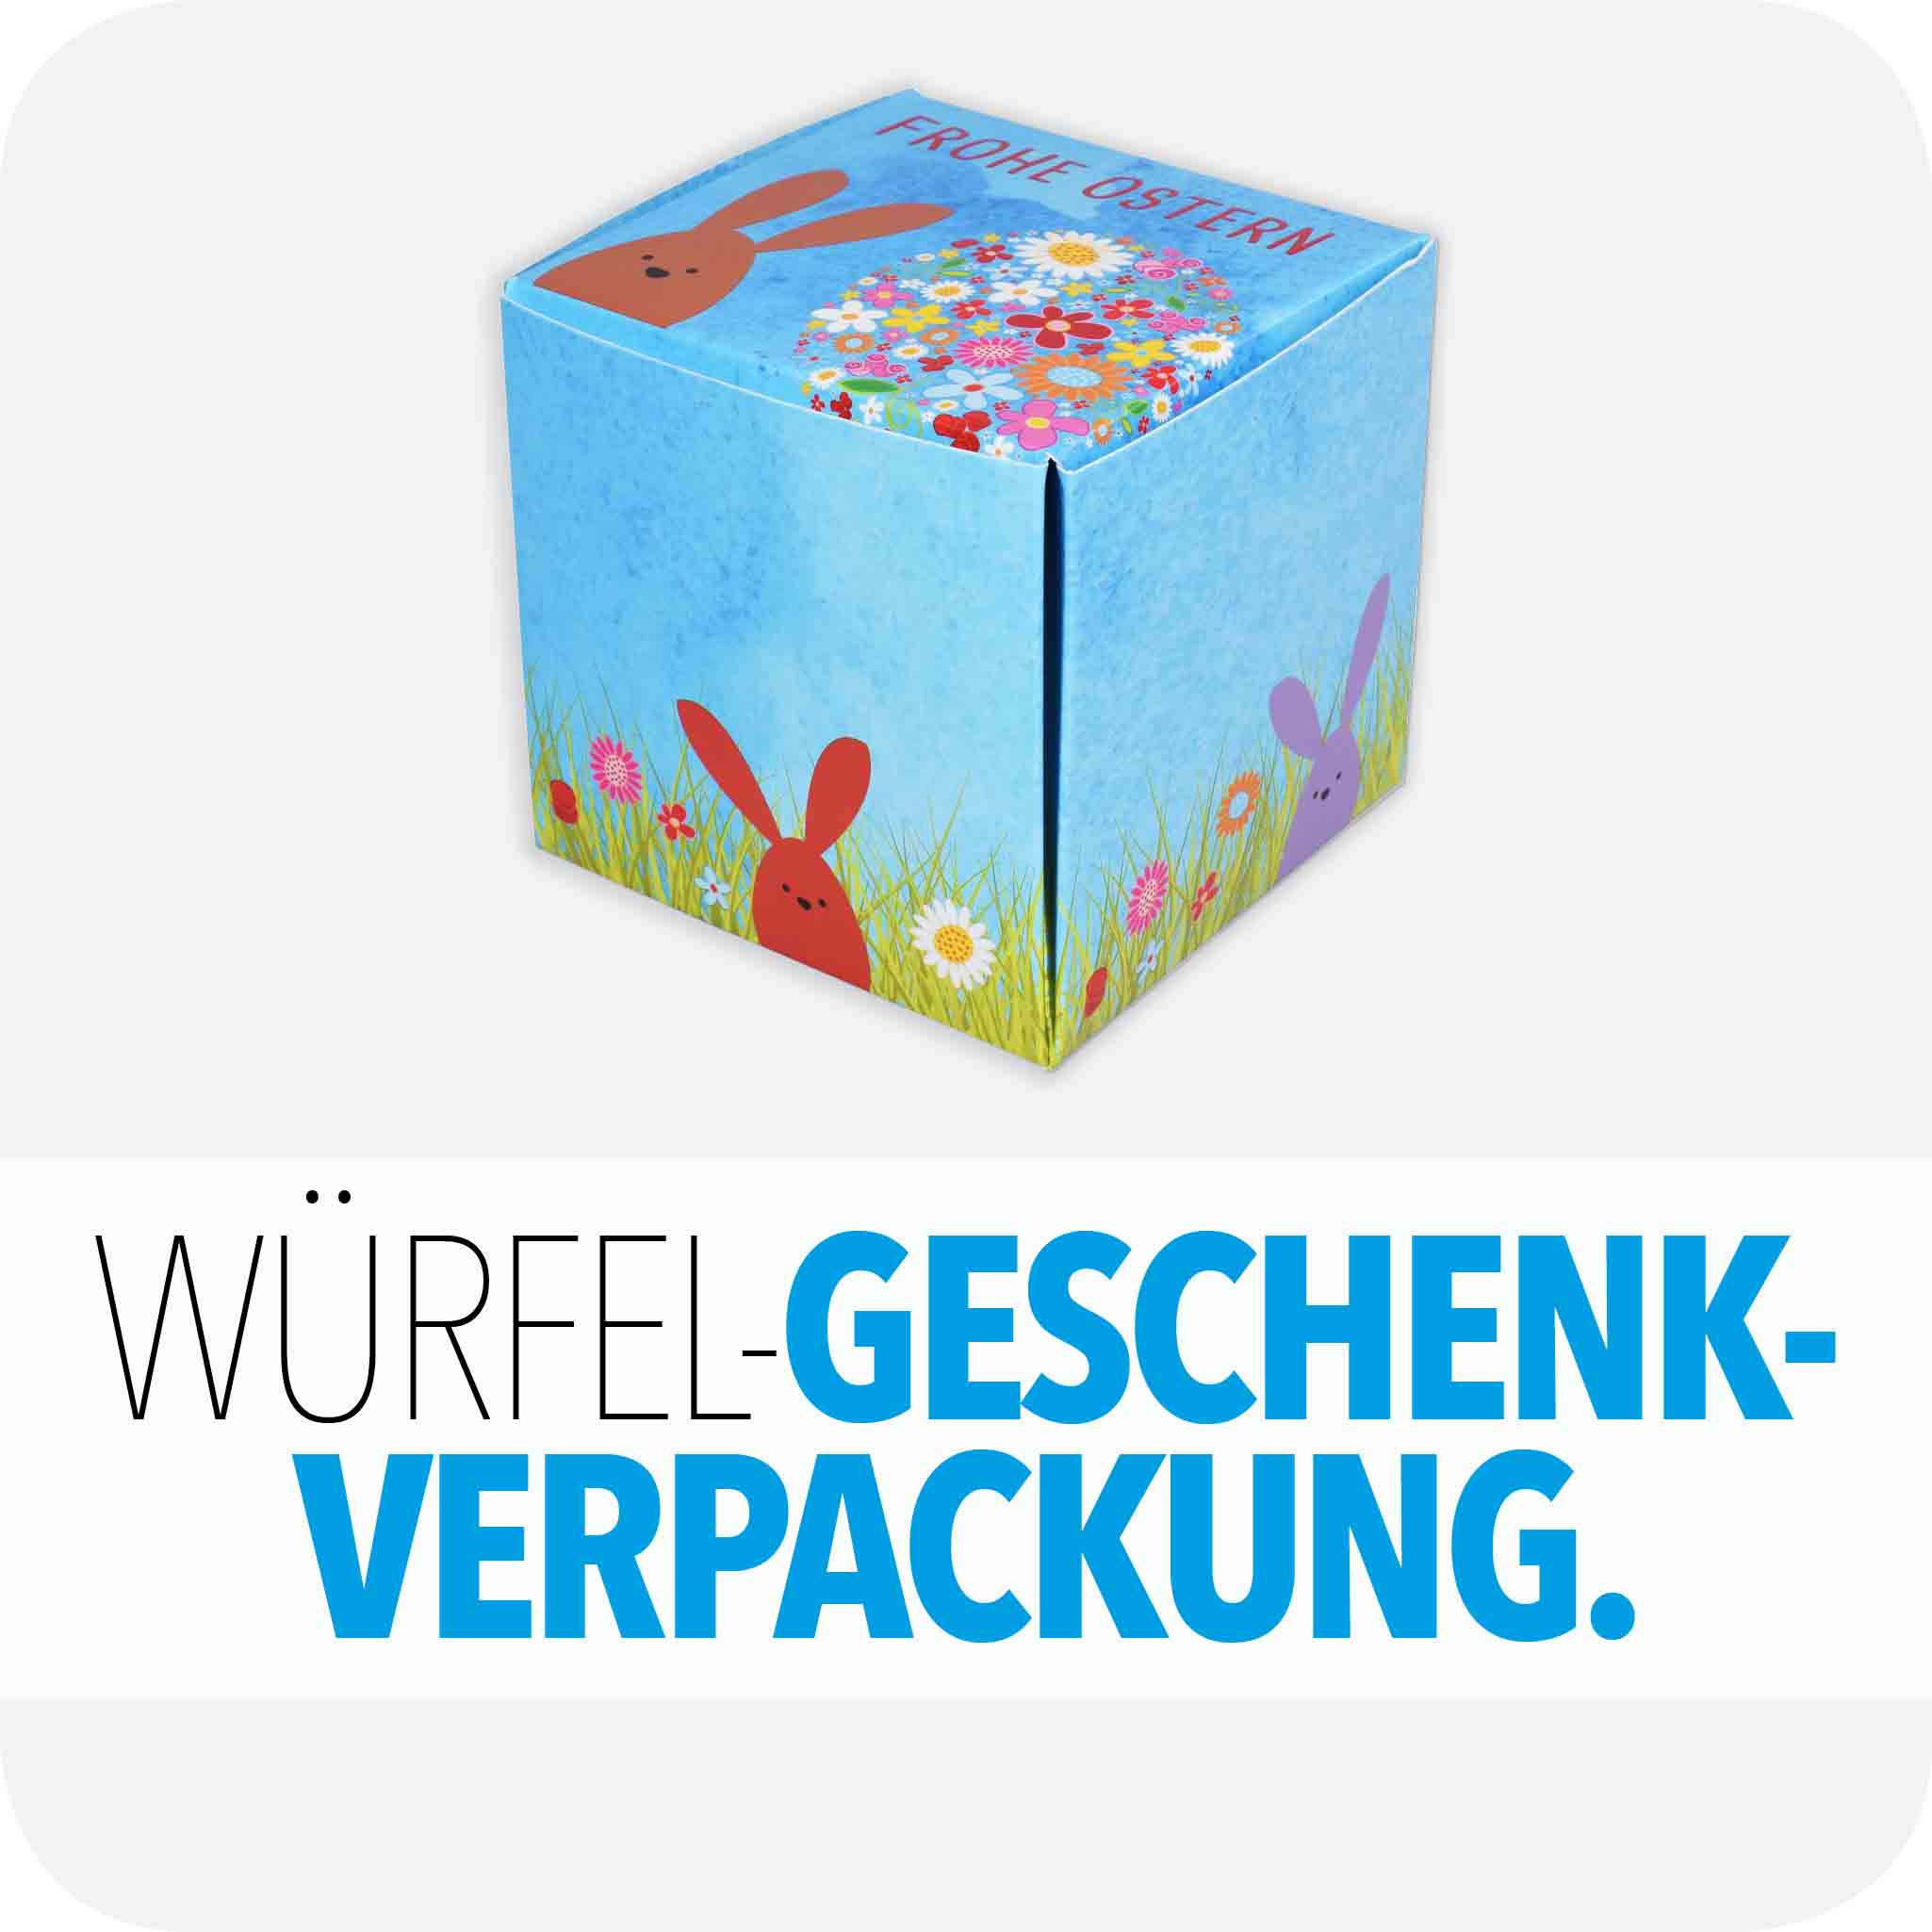 Würfel-Geschenkevrpackung